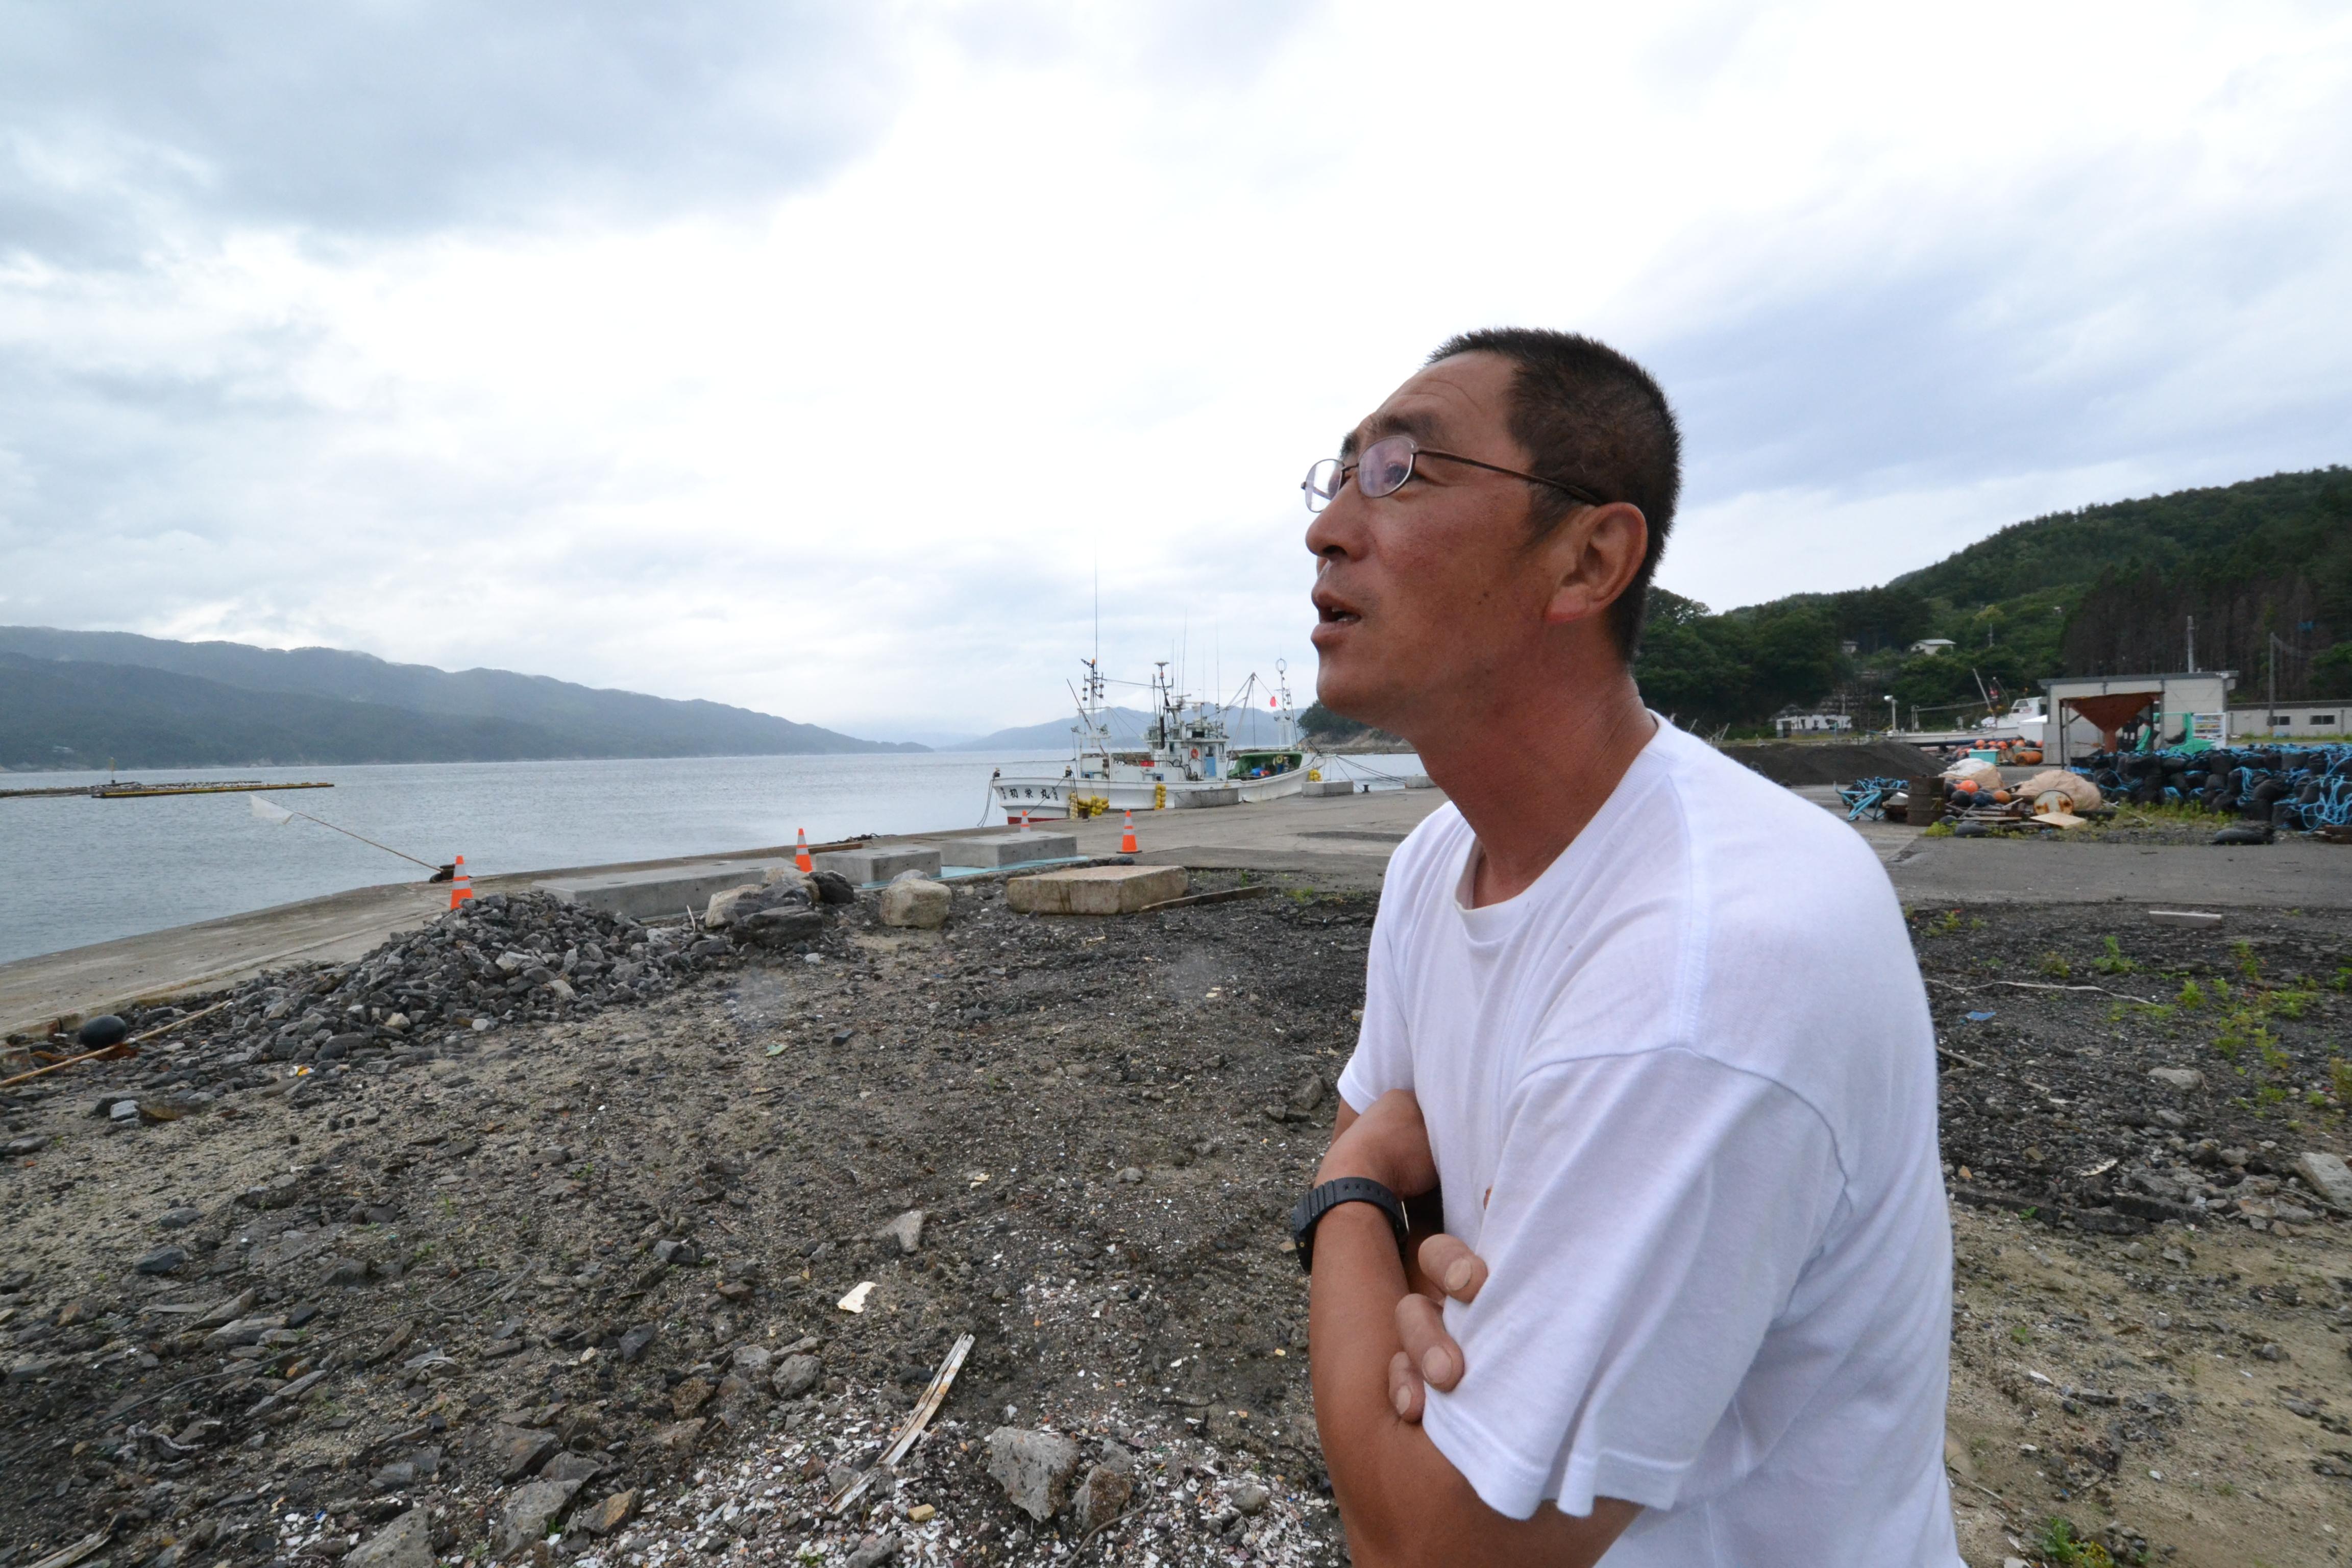 otsuchi wakame fishermen looks out 2.JPG